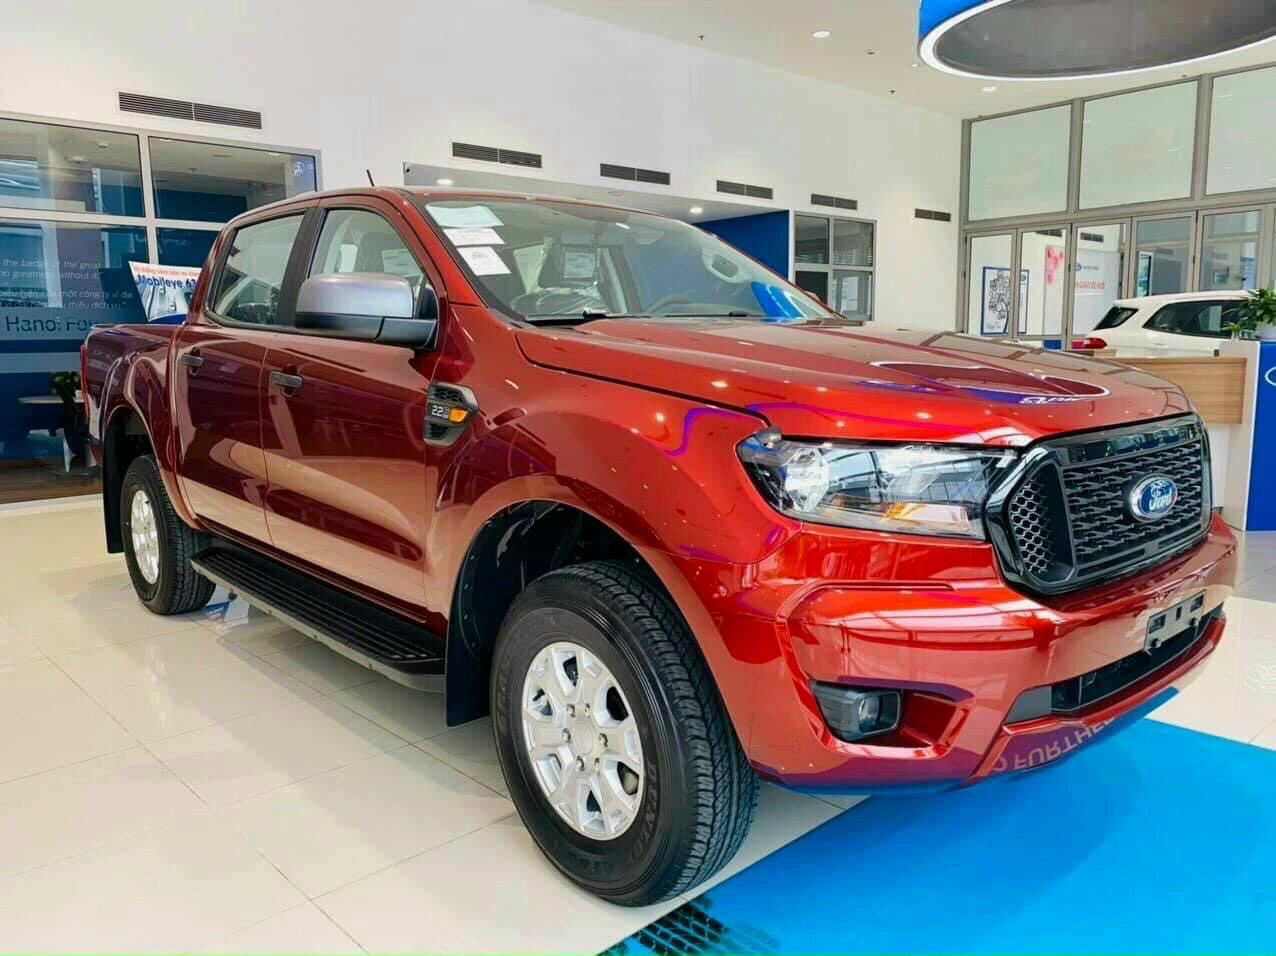 Ford Ranger XLS 2.2L 4×2 AT12